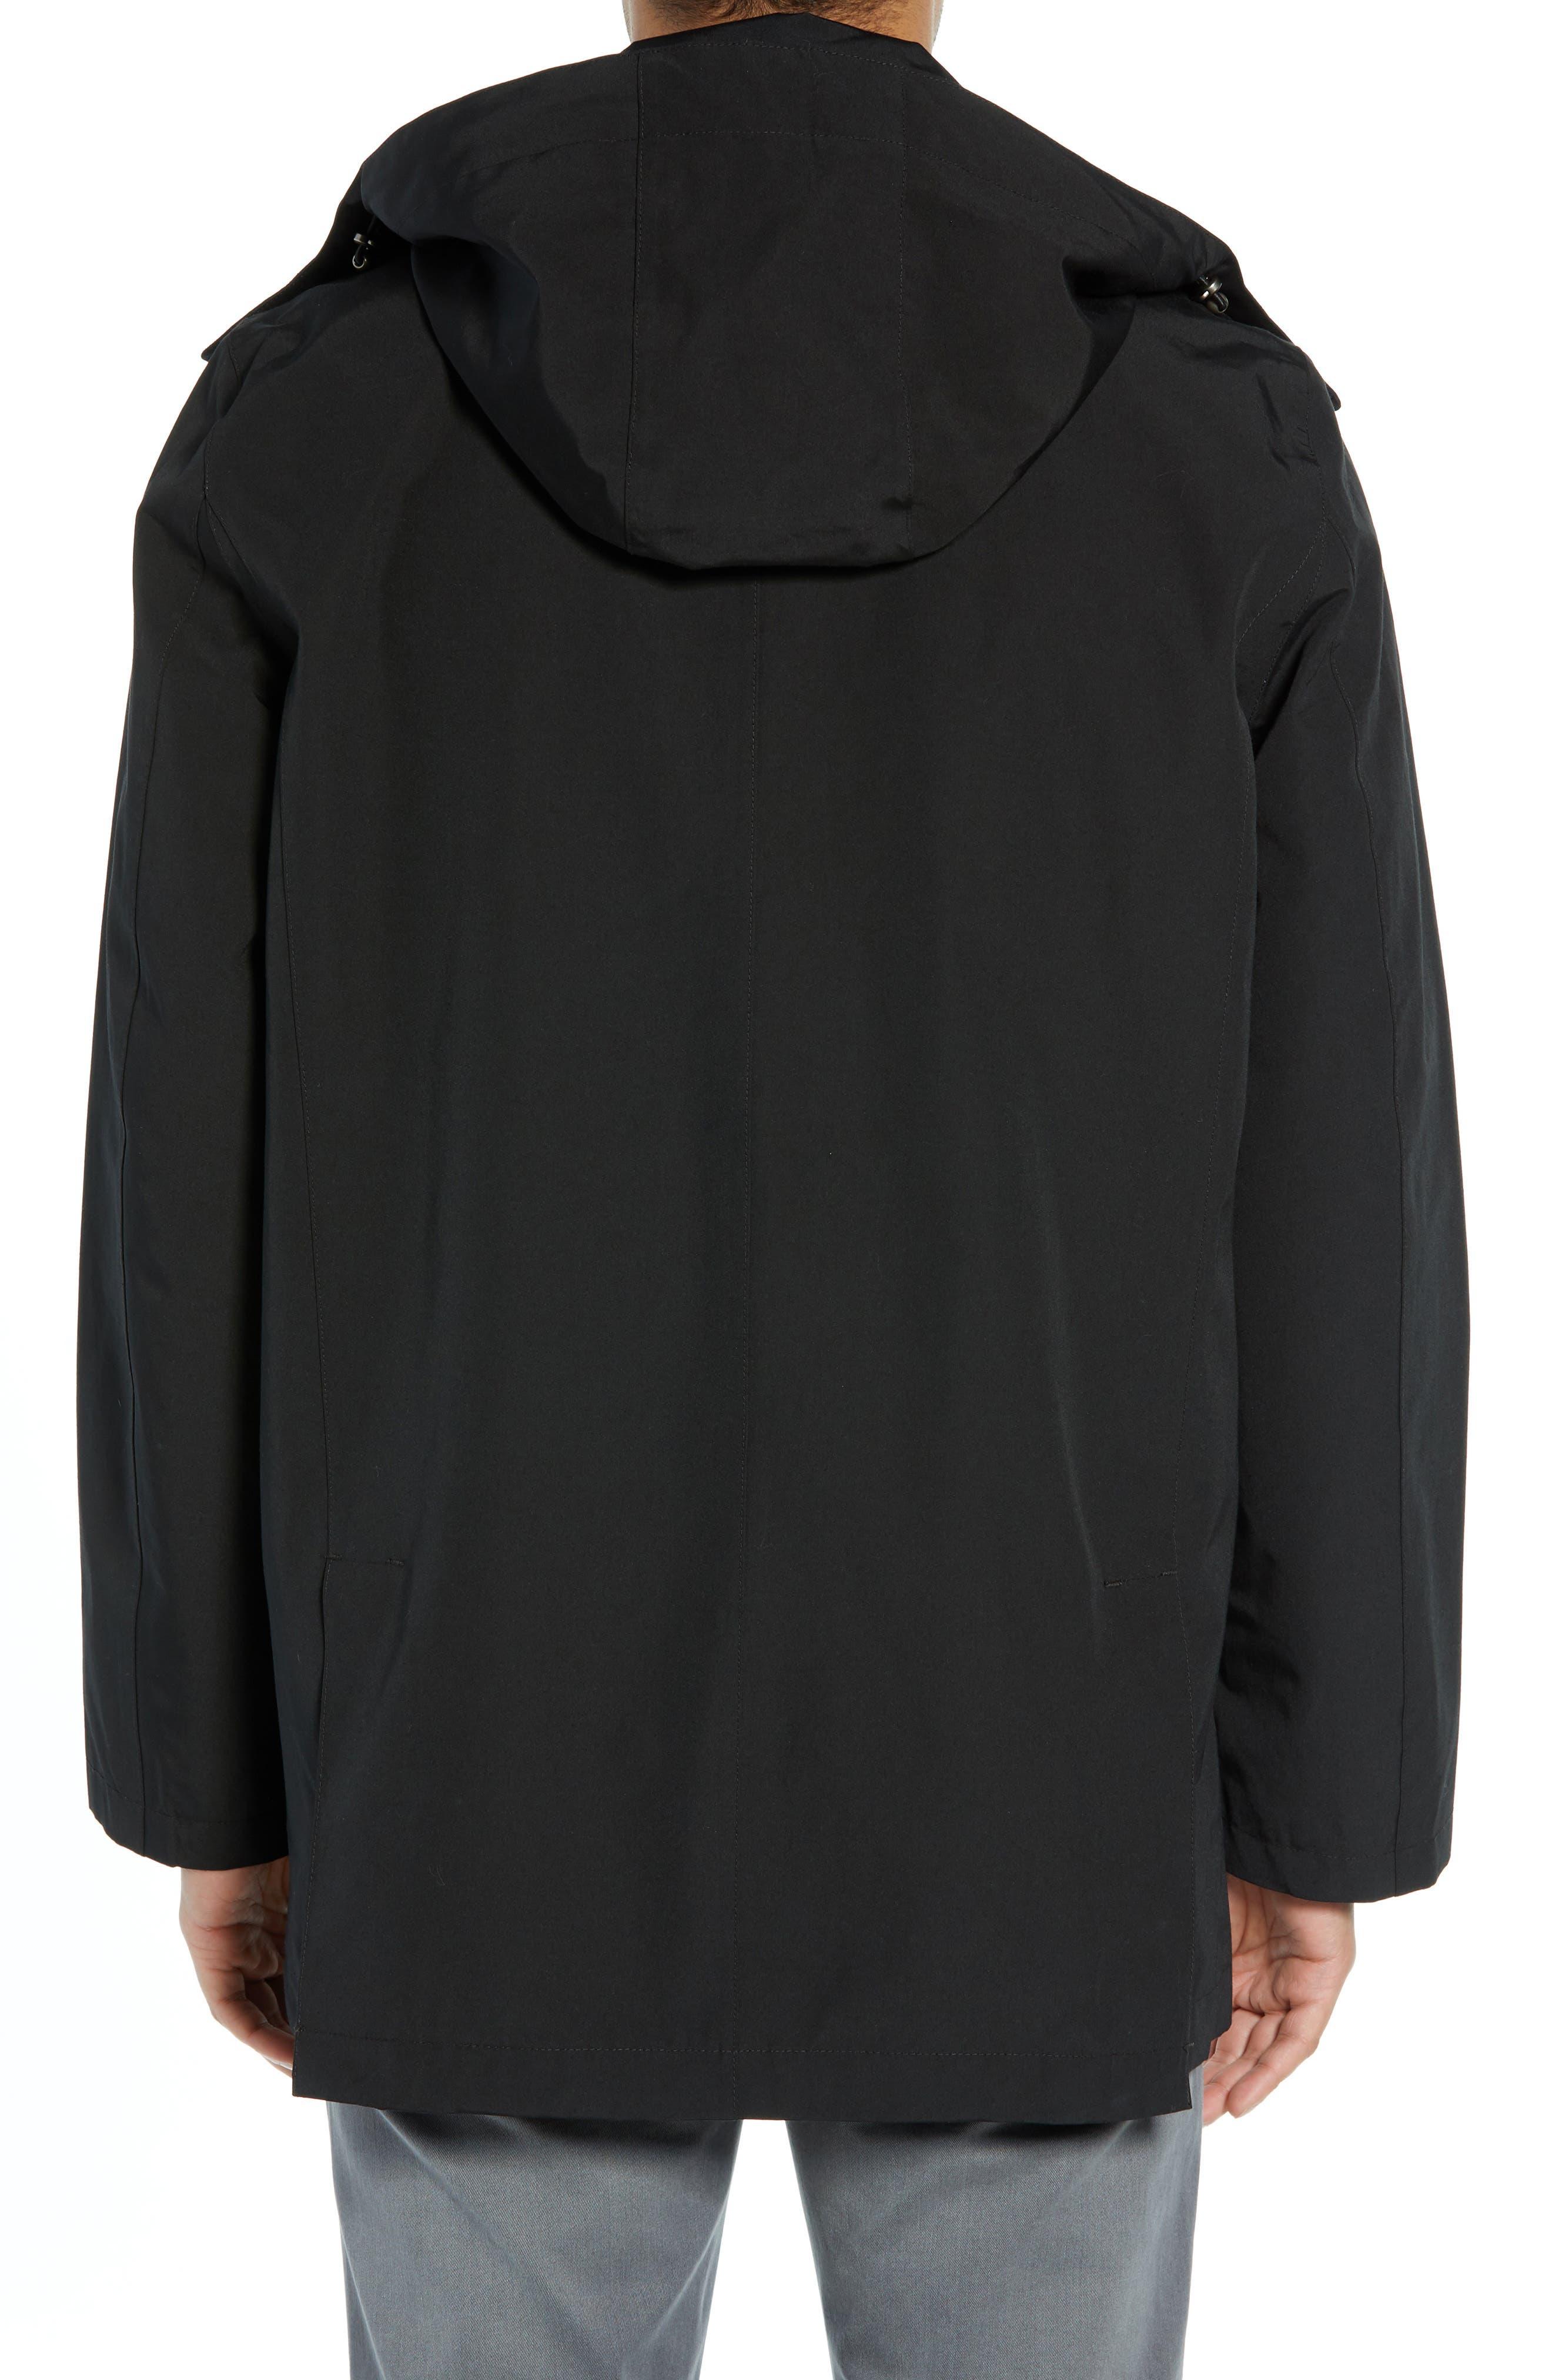 PENDLETON, Harbor Cloth Seattle Raincoat, Alternate thumbnail 2, color, BLACK